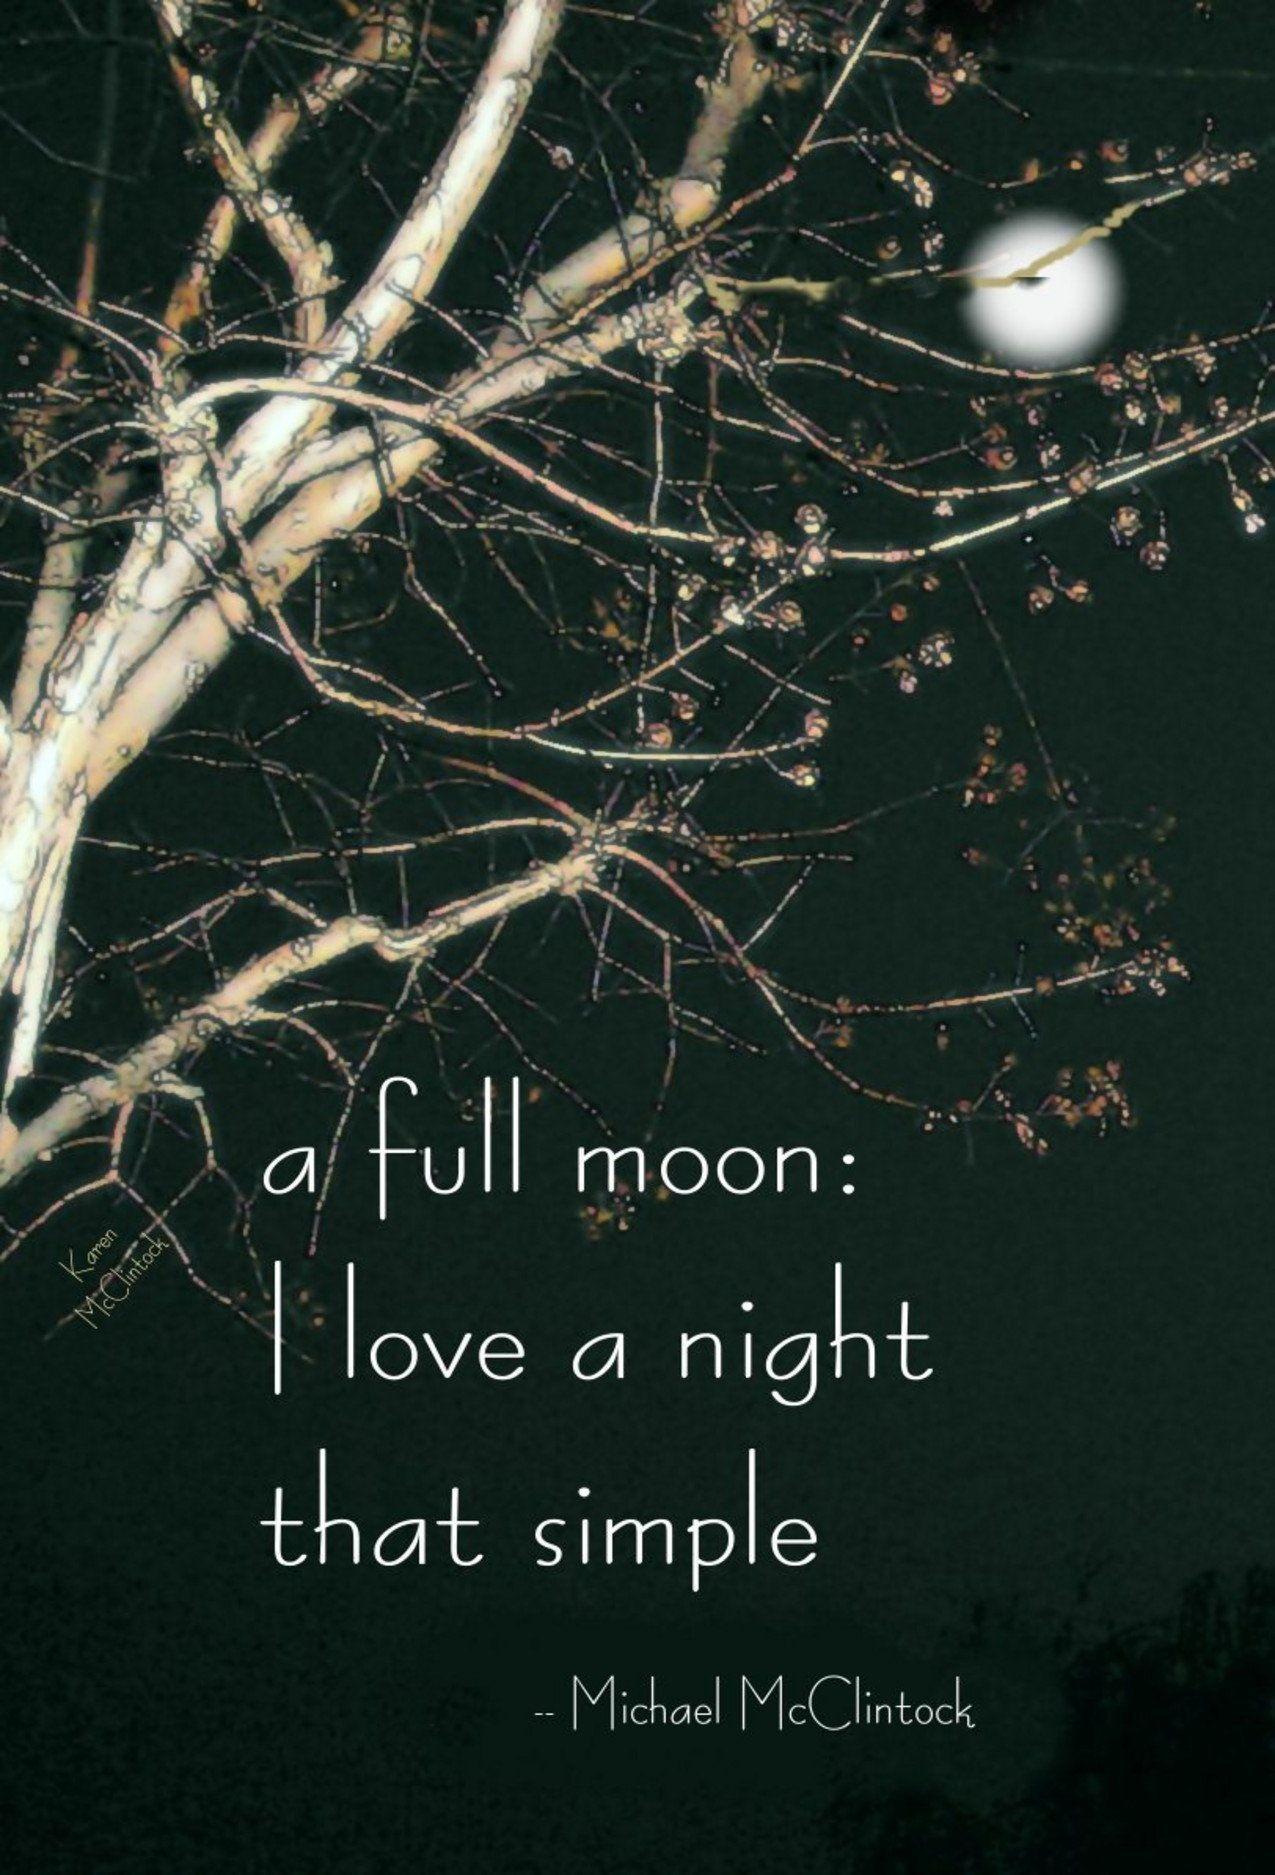 Haiku Poem A Full Moon By Michael Mcclintock Haiku Poetry By